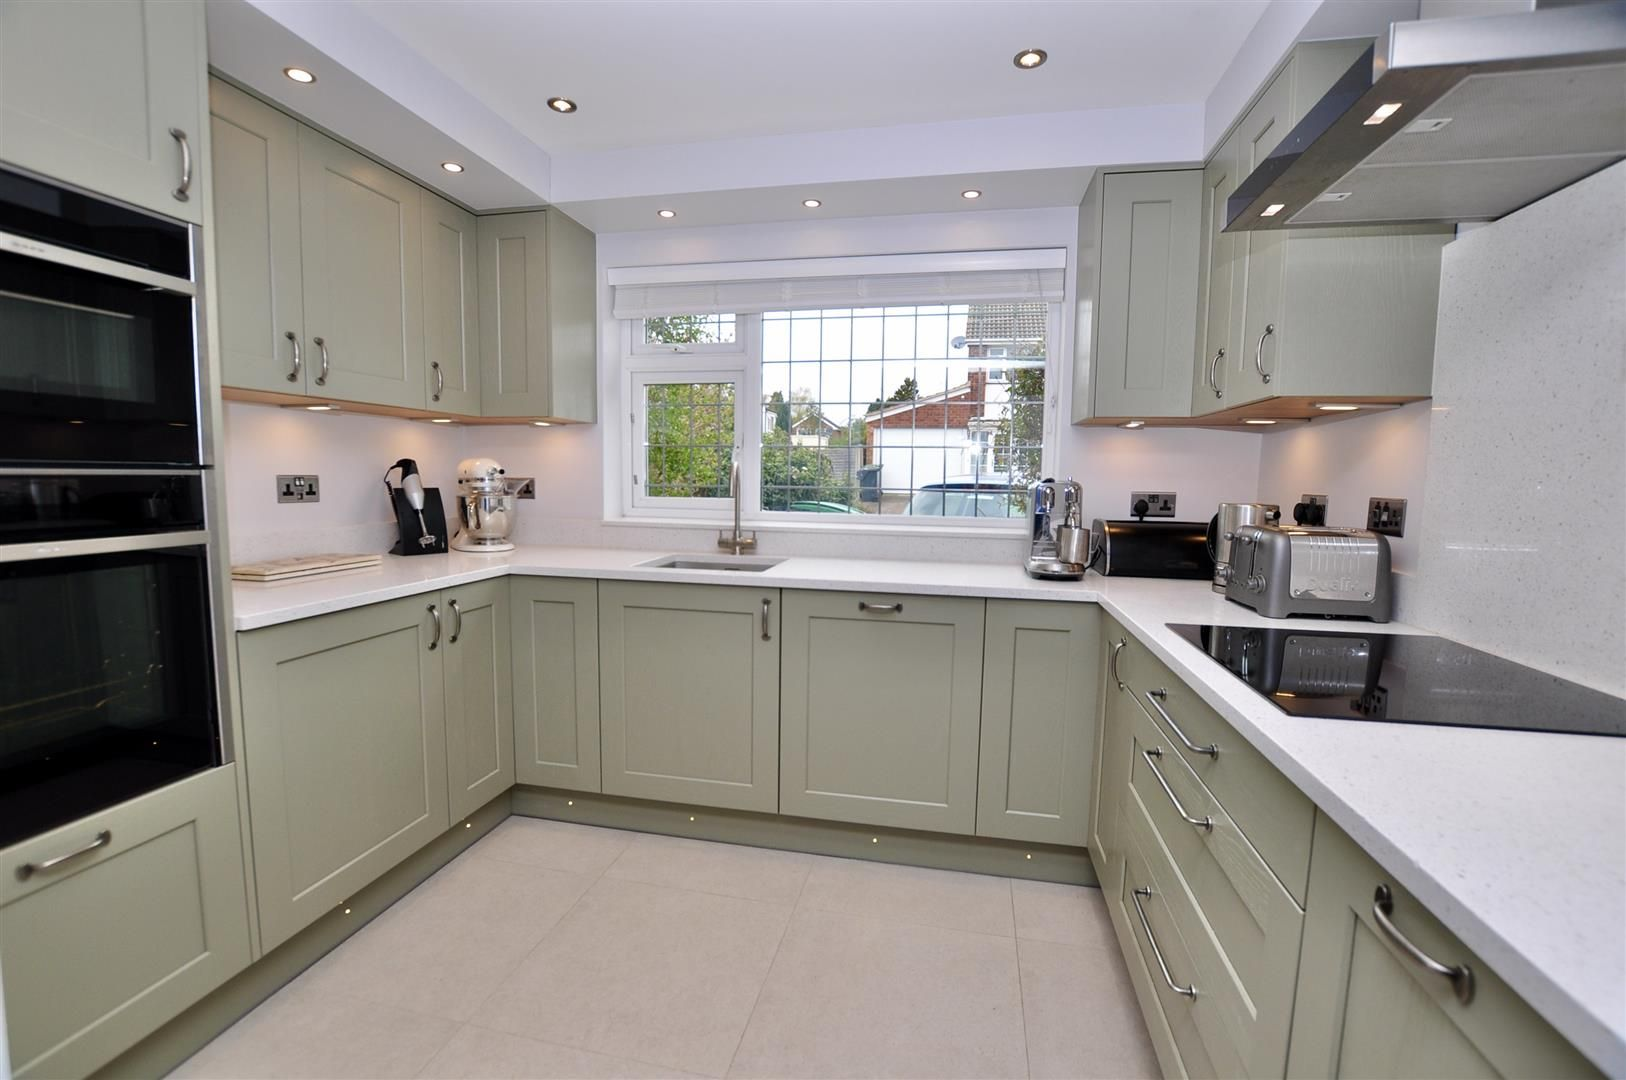 4 bed link-detached-house for sale in Hagley  - Property Image 2